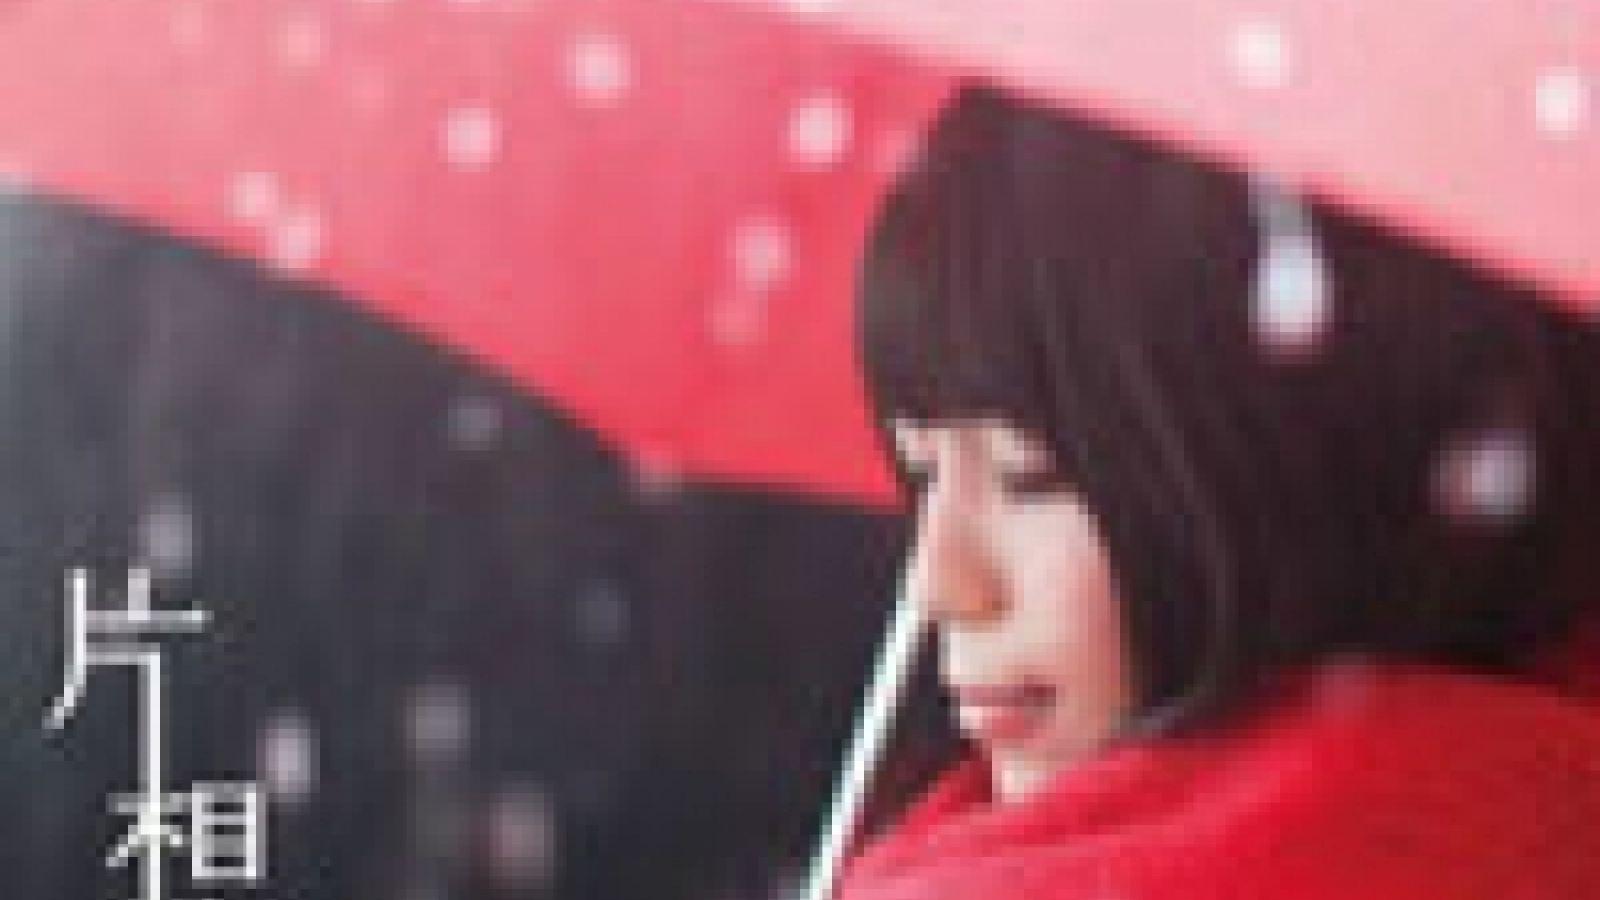 Kataomoi, novo single de miwa © PONY CANYON INC.